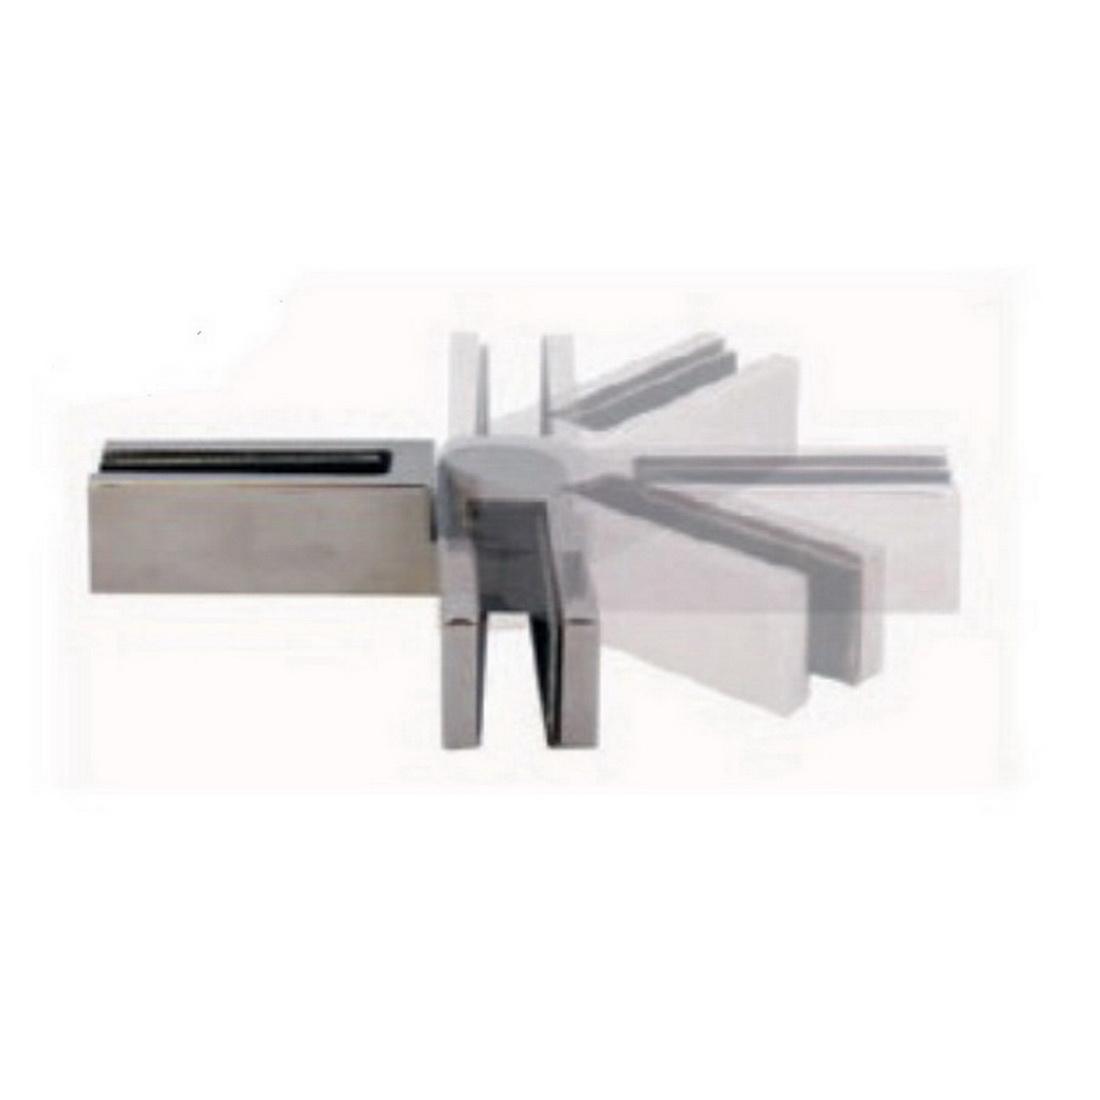 Glass-To-Glass Swivel Rigi Clamp 316 Stainless Steel